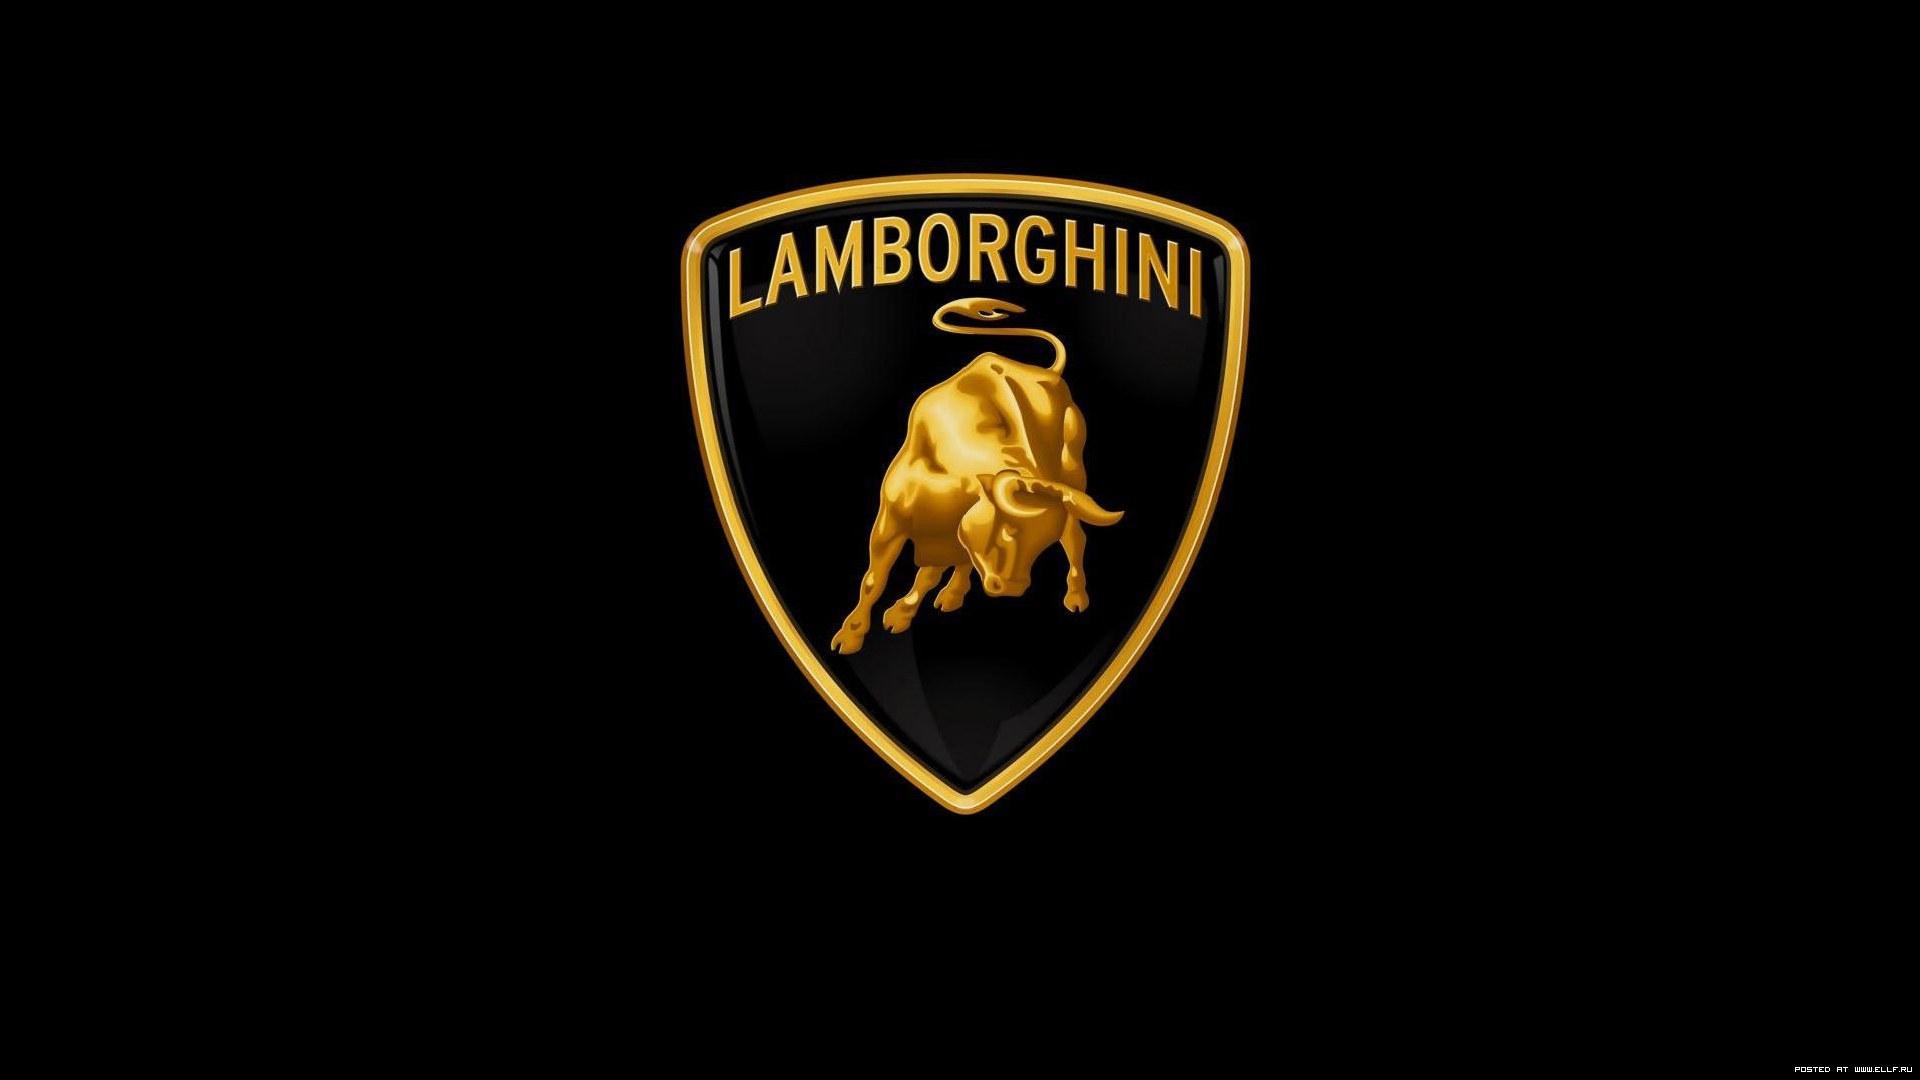 11961 download wallpaper Brands, Logos, Lamborghini screensavers and pictures for free